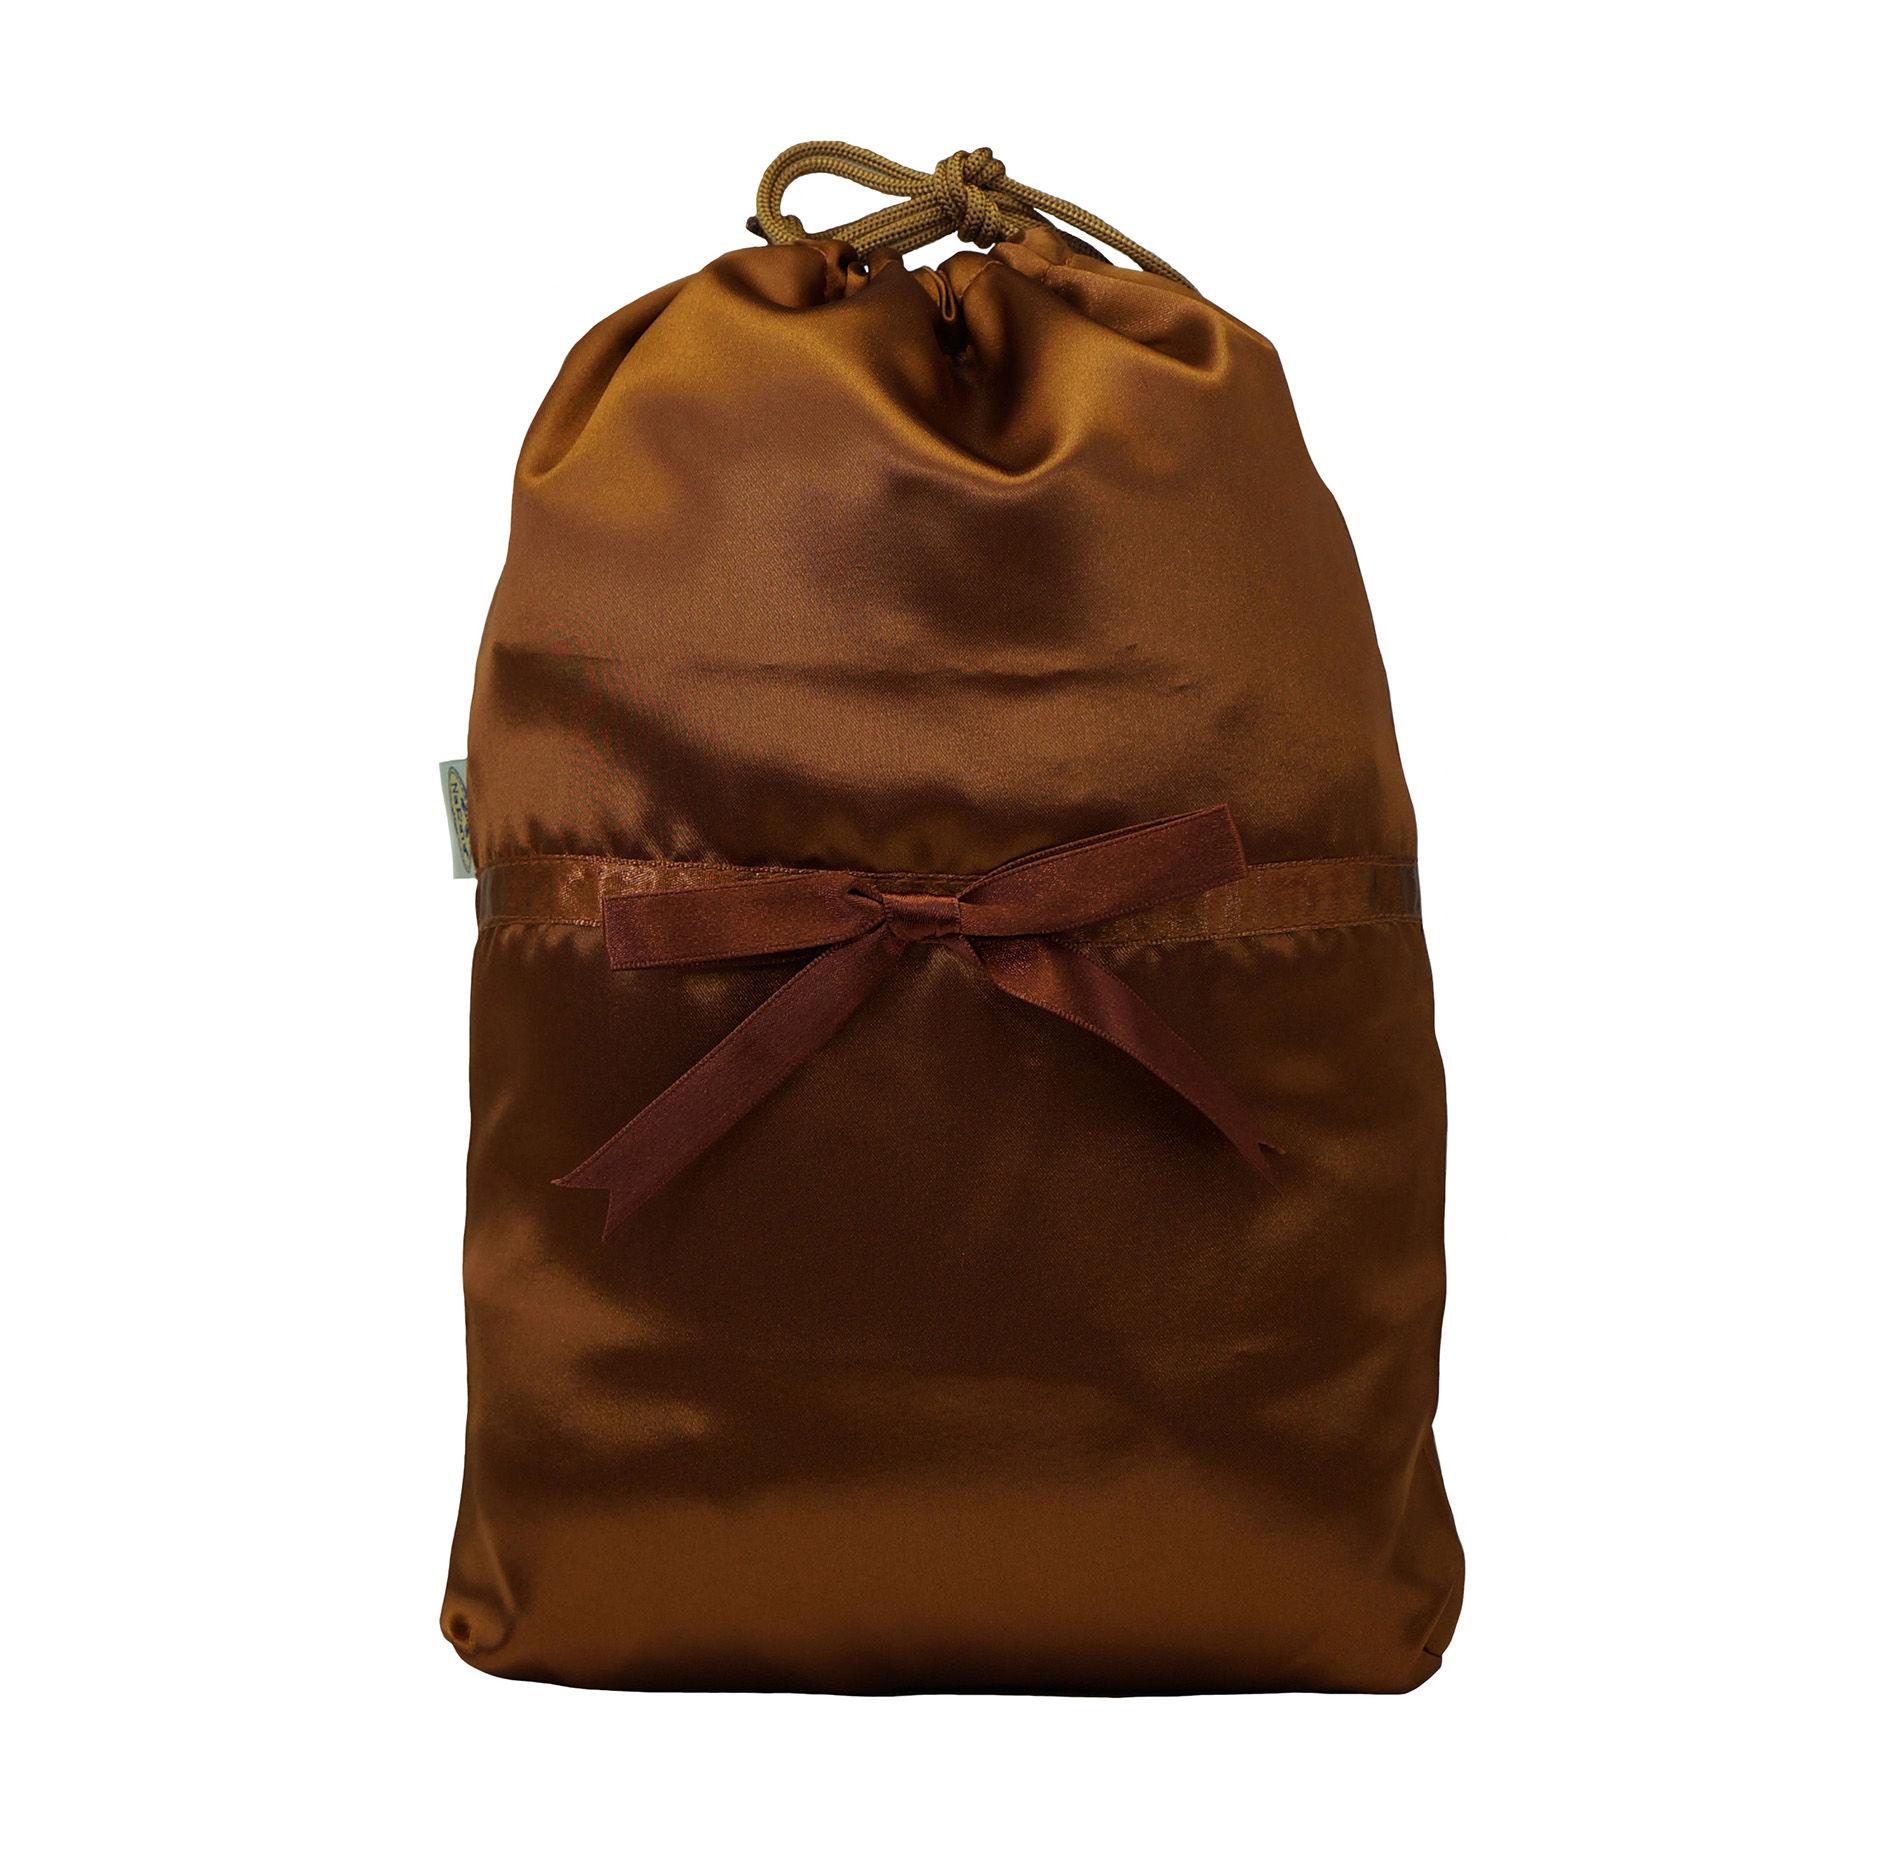 NaRaYa(ナラヤ) 巾着袋コスメポーチ( ランジェリーポーチ トラベルポーチ )(L)・サテン(テラコッタ) NBS-258/M